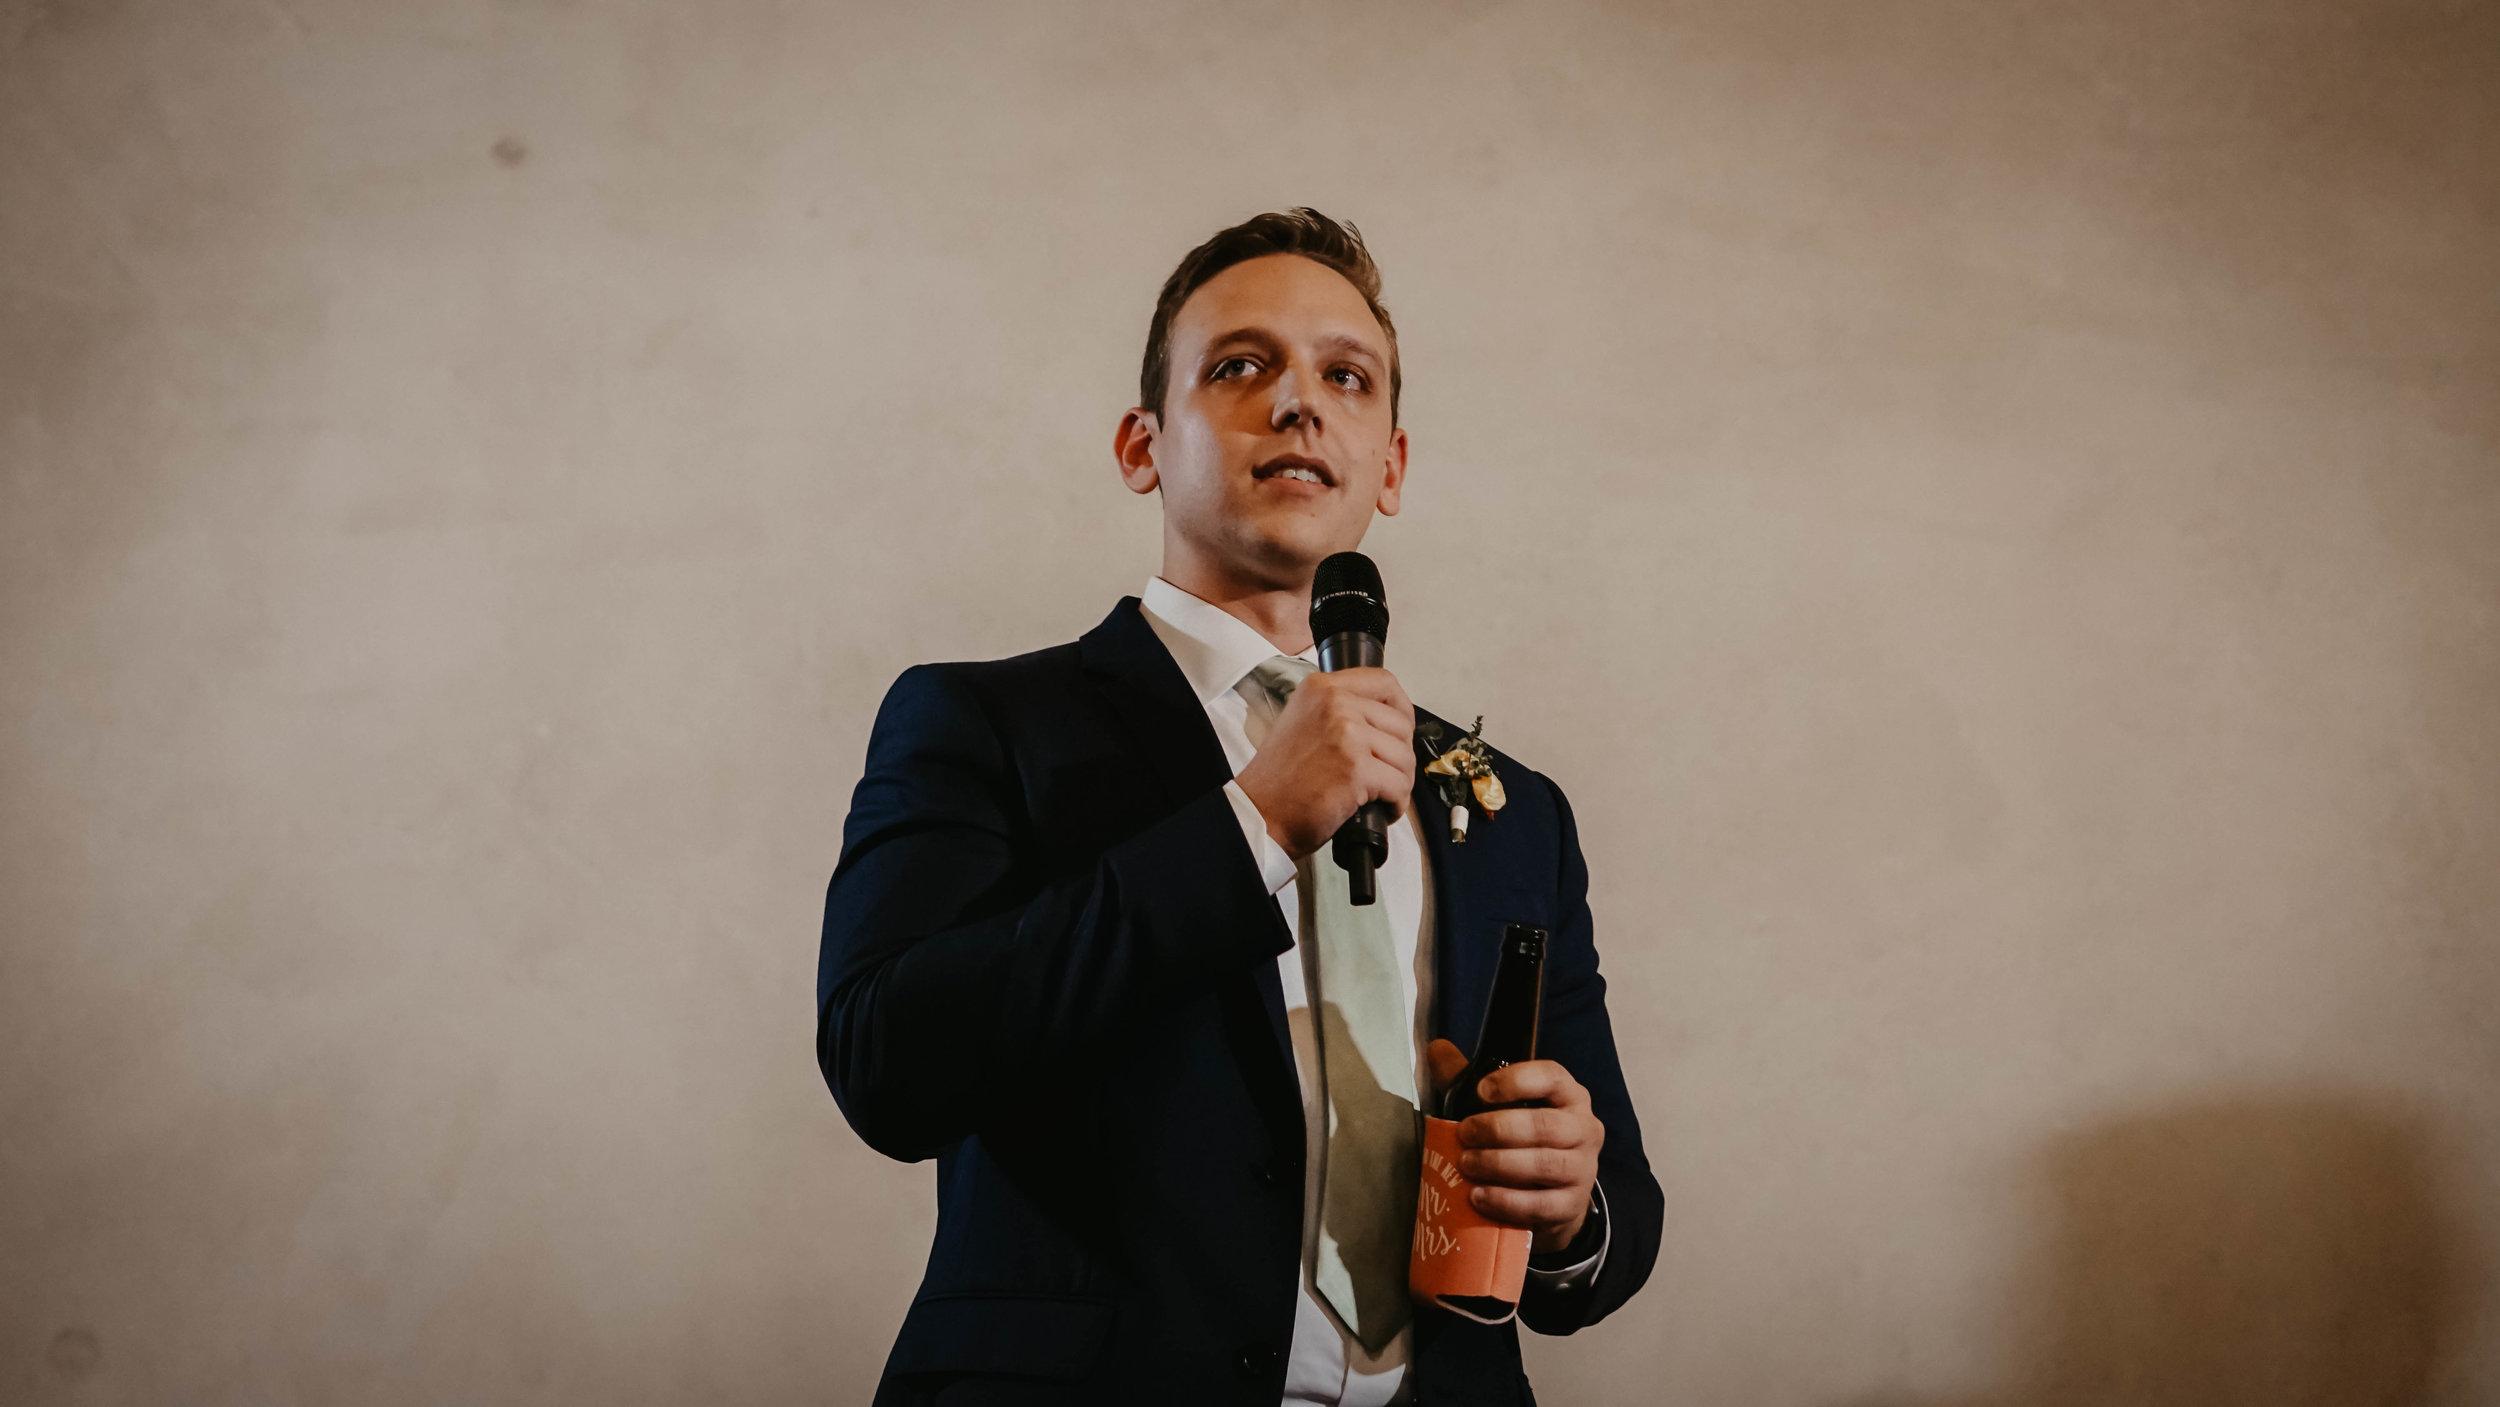 austin-wedding-videographer (81 of 999).jpg